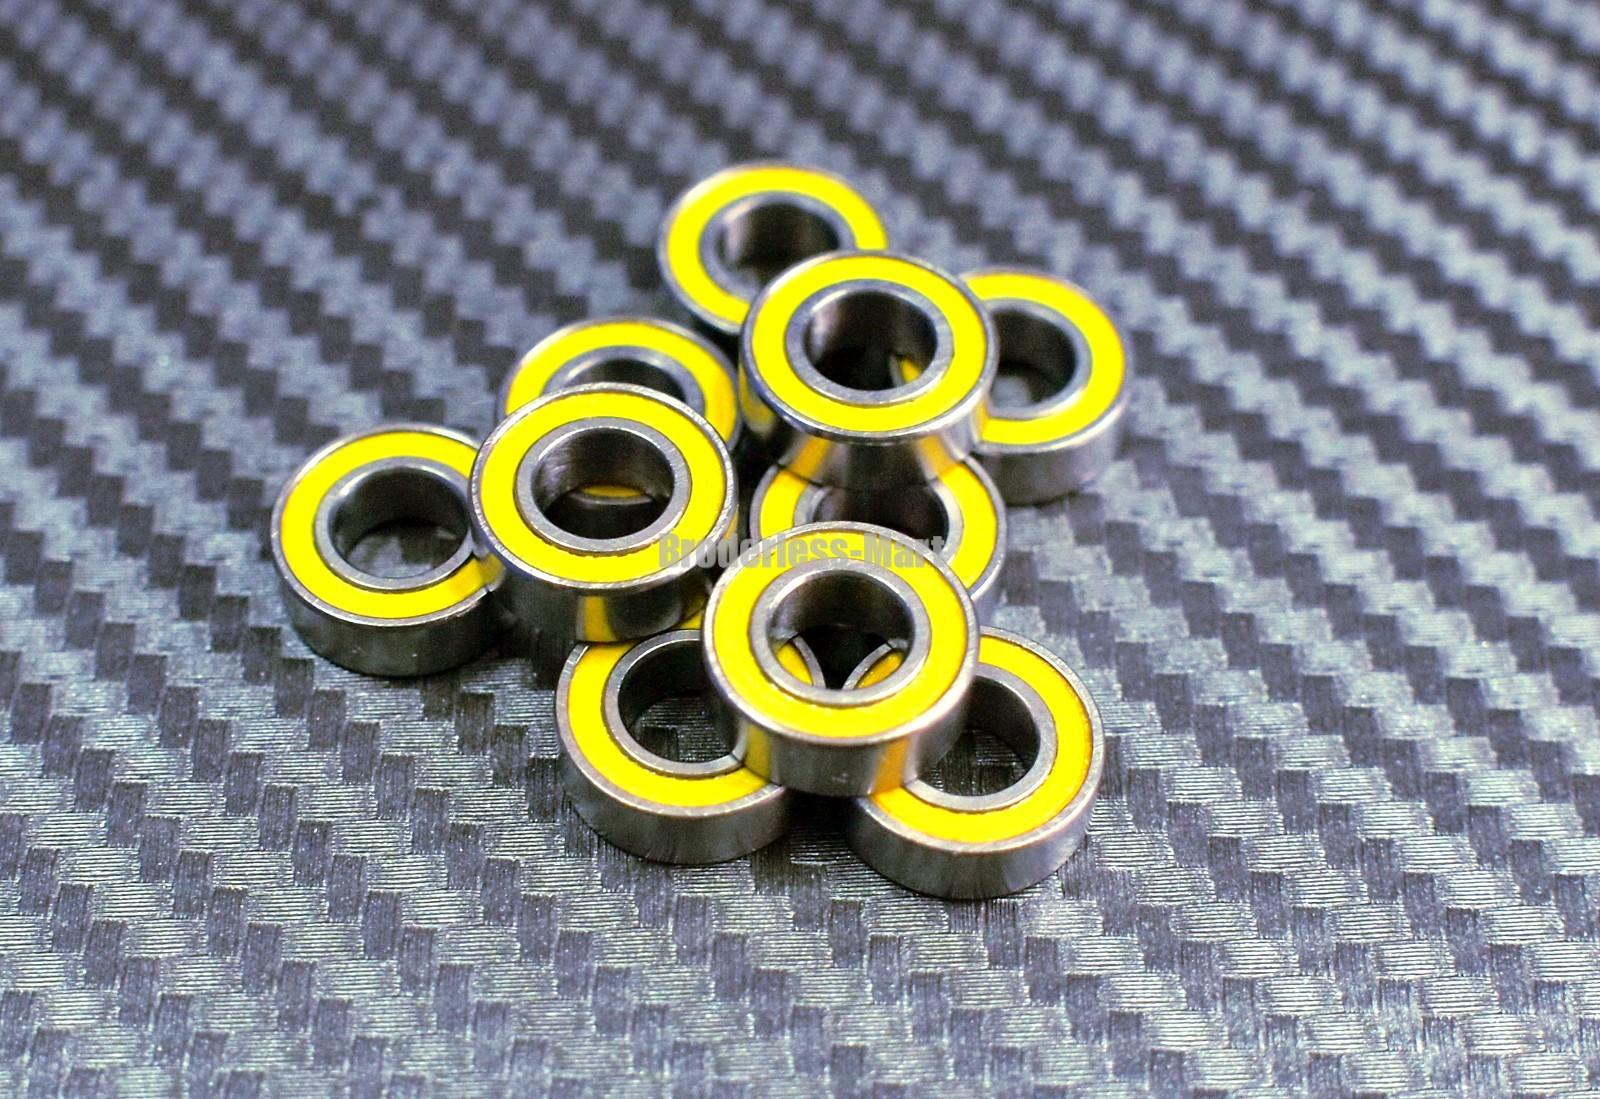 6x10x3 mm 4 Pcs Rubber Ball Bearing Bearings YELLOW 6*10*3 MR106RS MR106-2RS